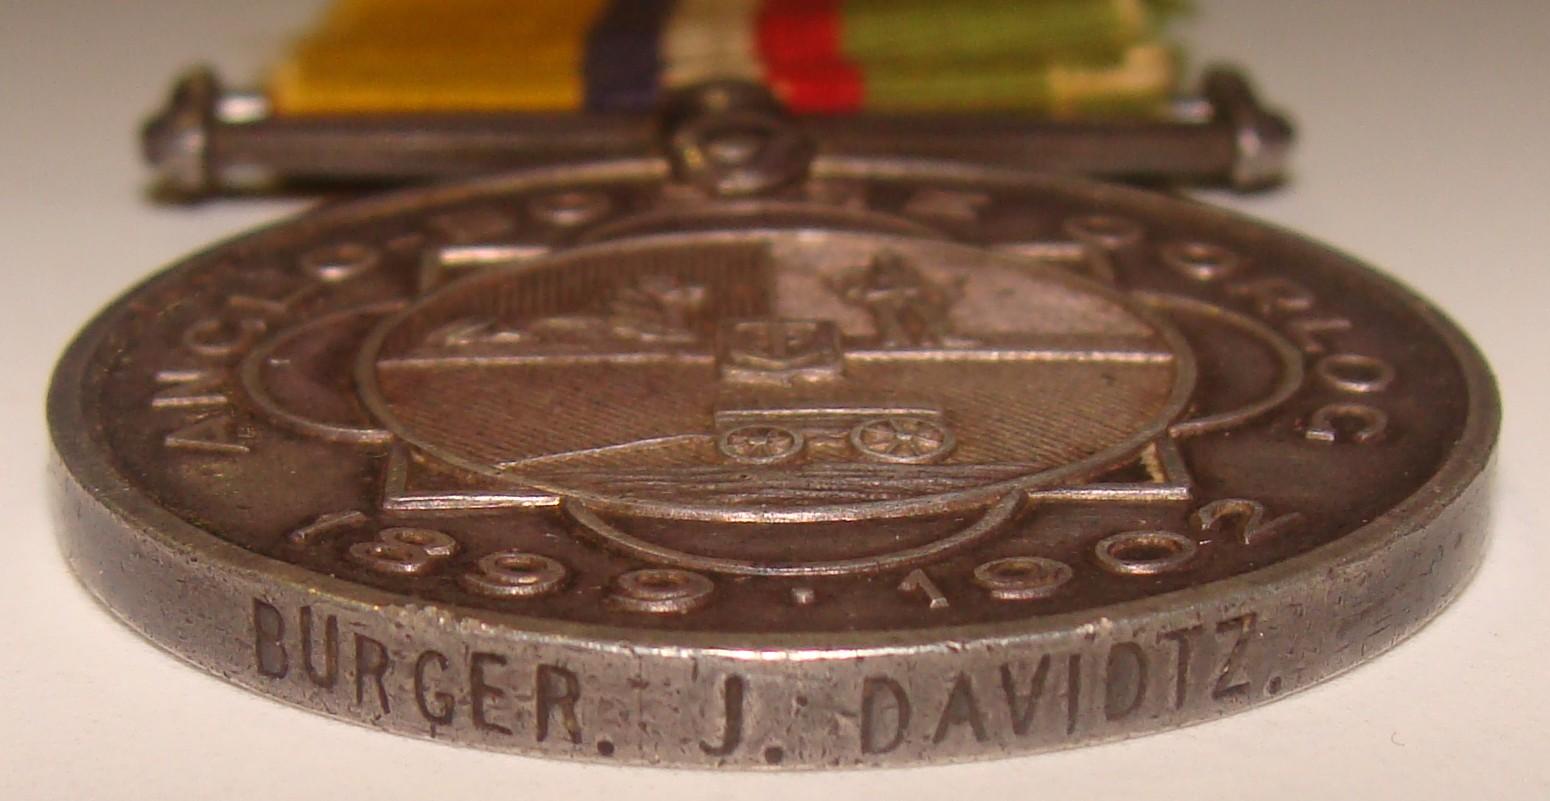 ABO Medal - Davidtz, J - Burger